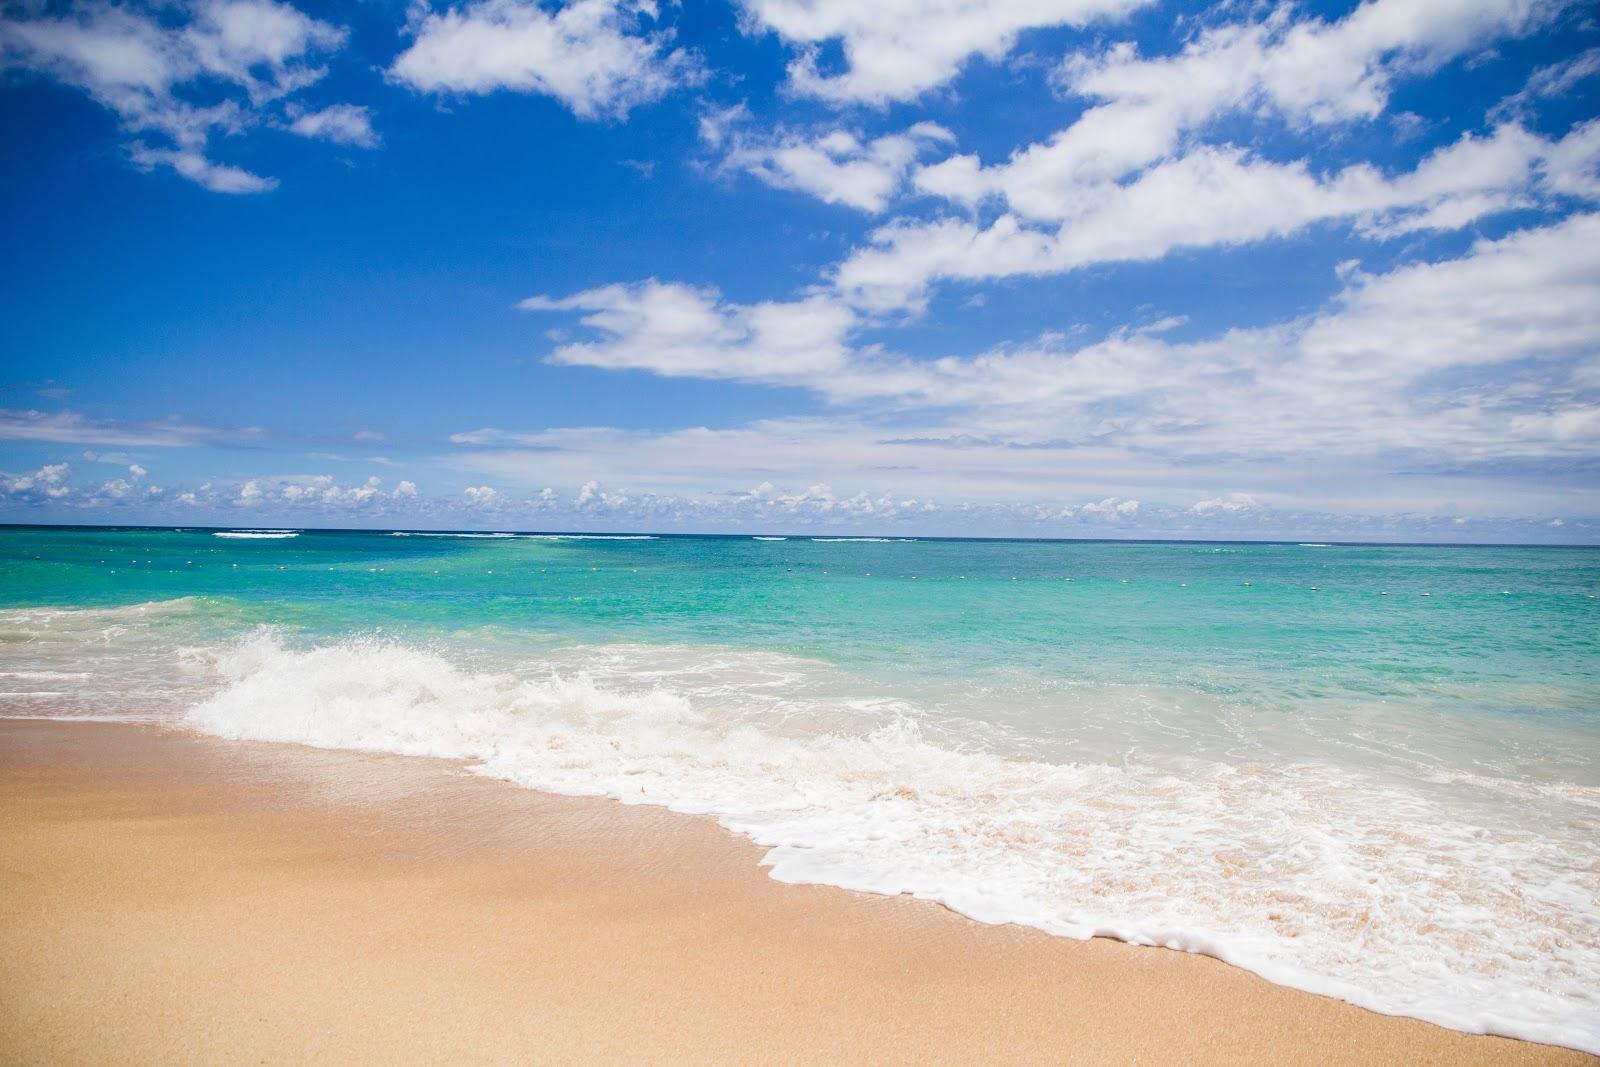 https://images.pexels.com/photos/459556/pexels-photo-459556.jpeg?cs=srgb&dl=background-beach-beautiful-459556.jpg&fm=jpg